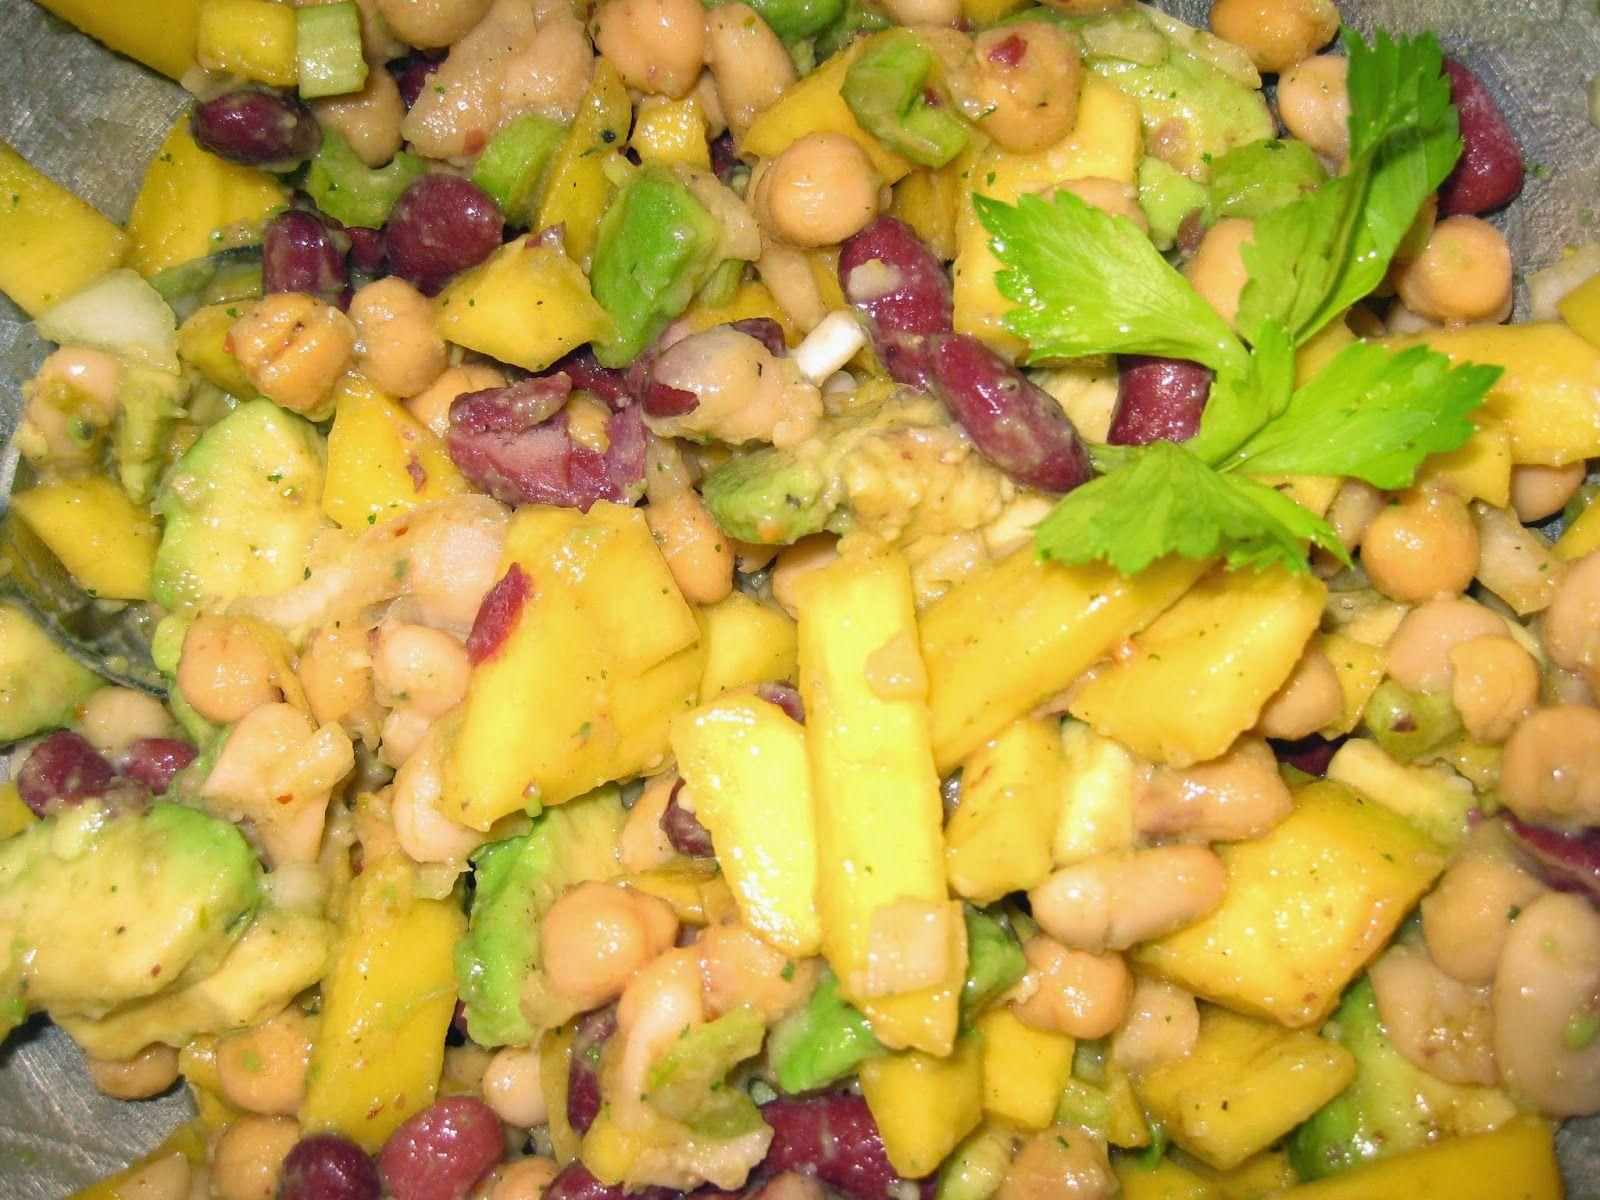 Berliner Zeitgeist: Three Bean Salad with Mango and Avocado